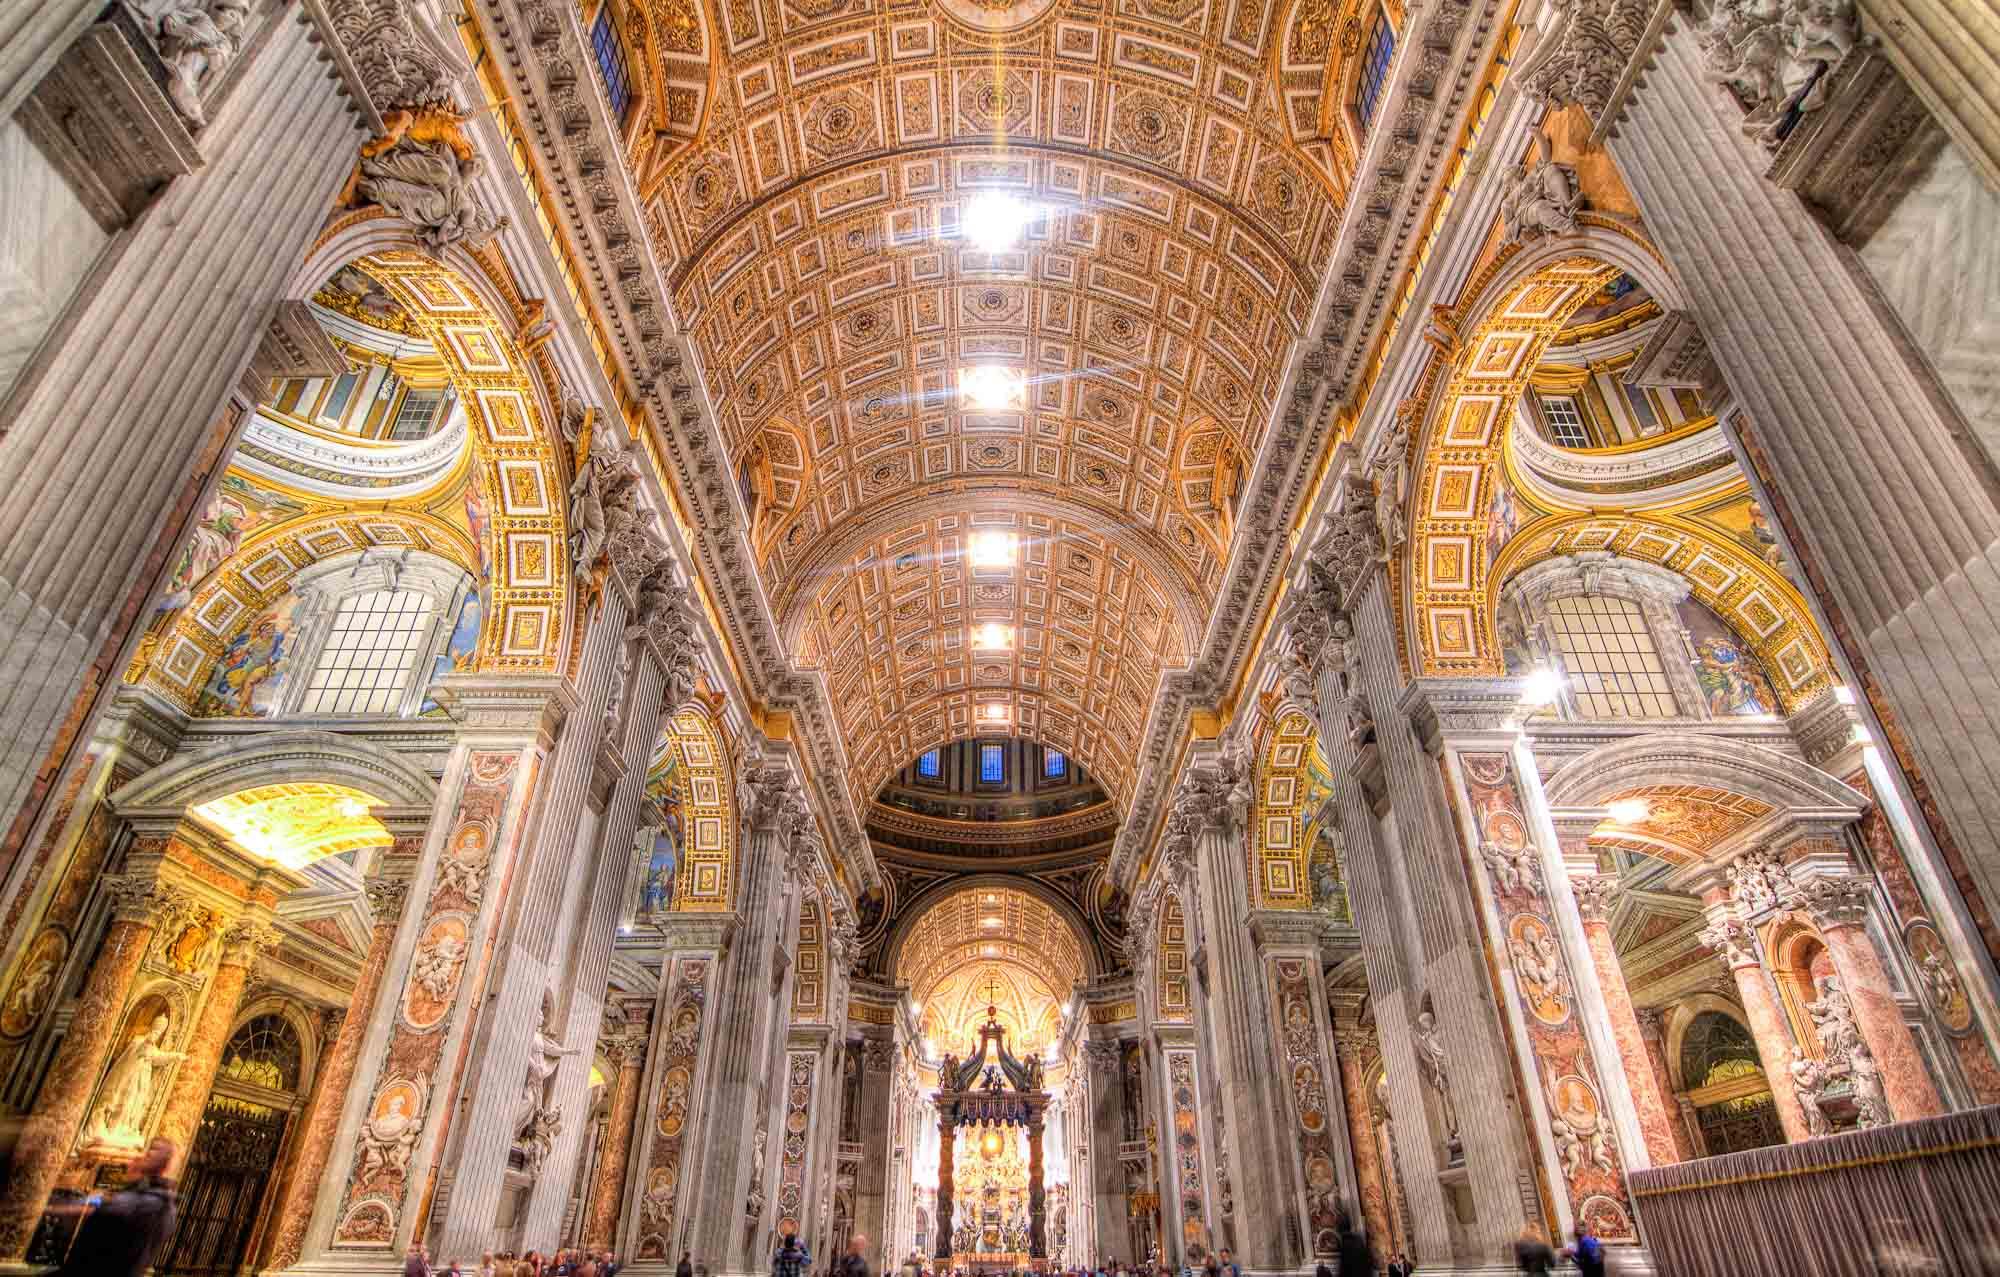 St. Pete's Basilica, Vatican City